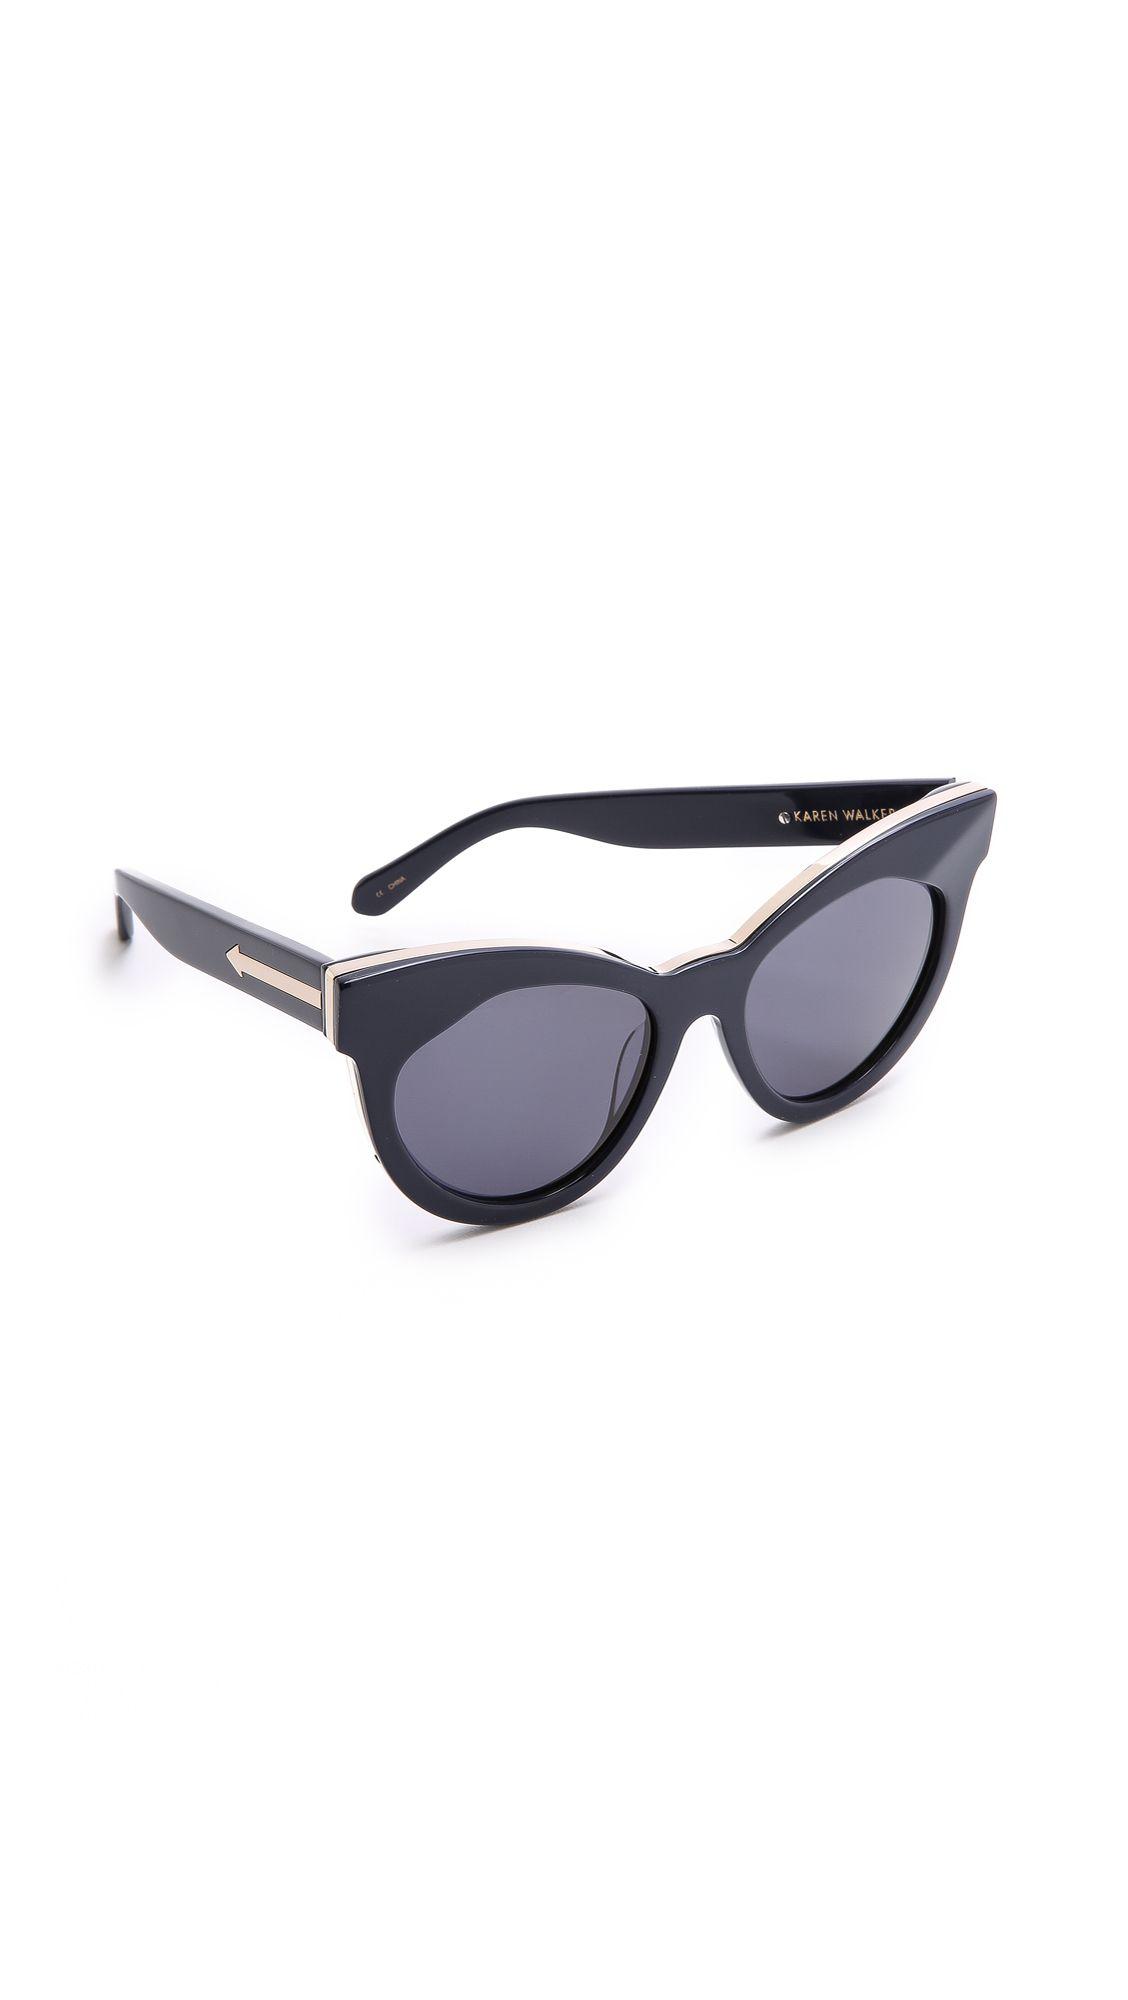 3e9633df5576 Number One 太阳眼镜 | Accessories | Karen walker sunglasses ...